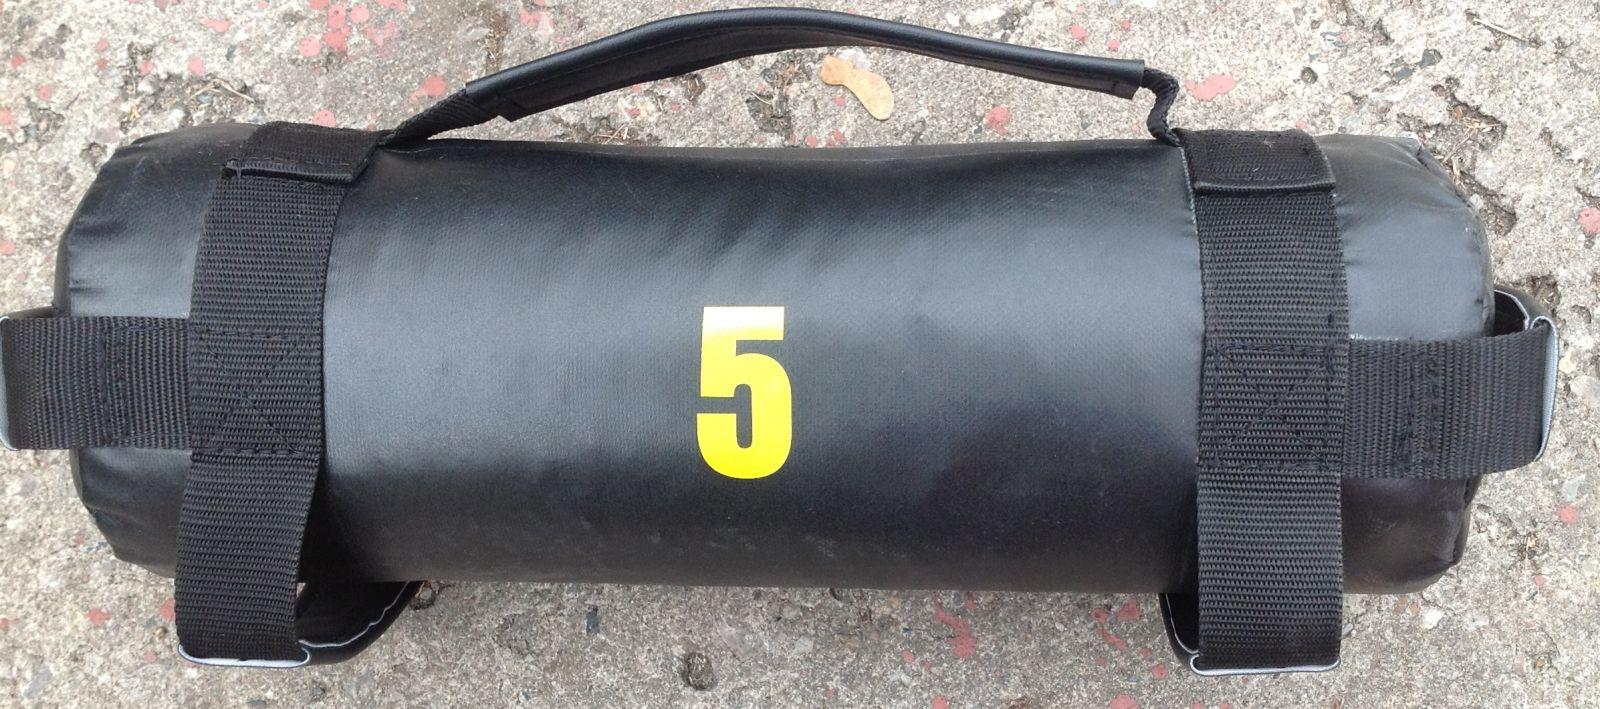 Powerbag, 5 kg, Bear foot, BEARFOOT